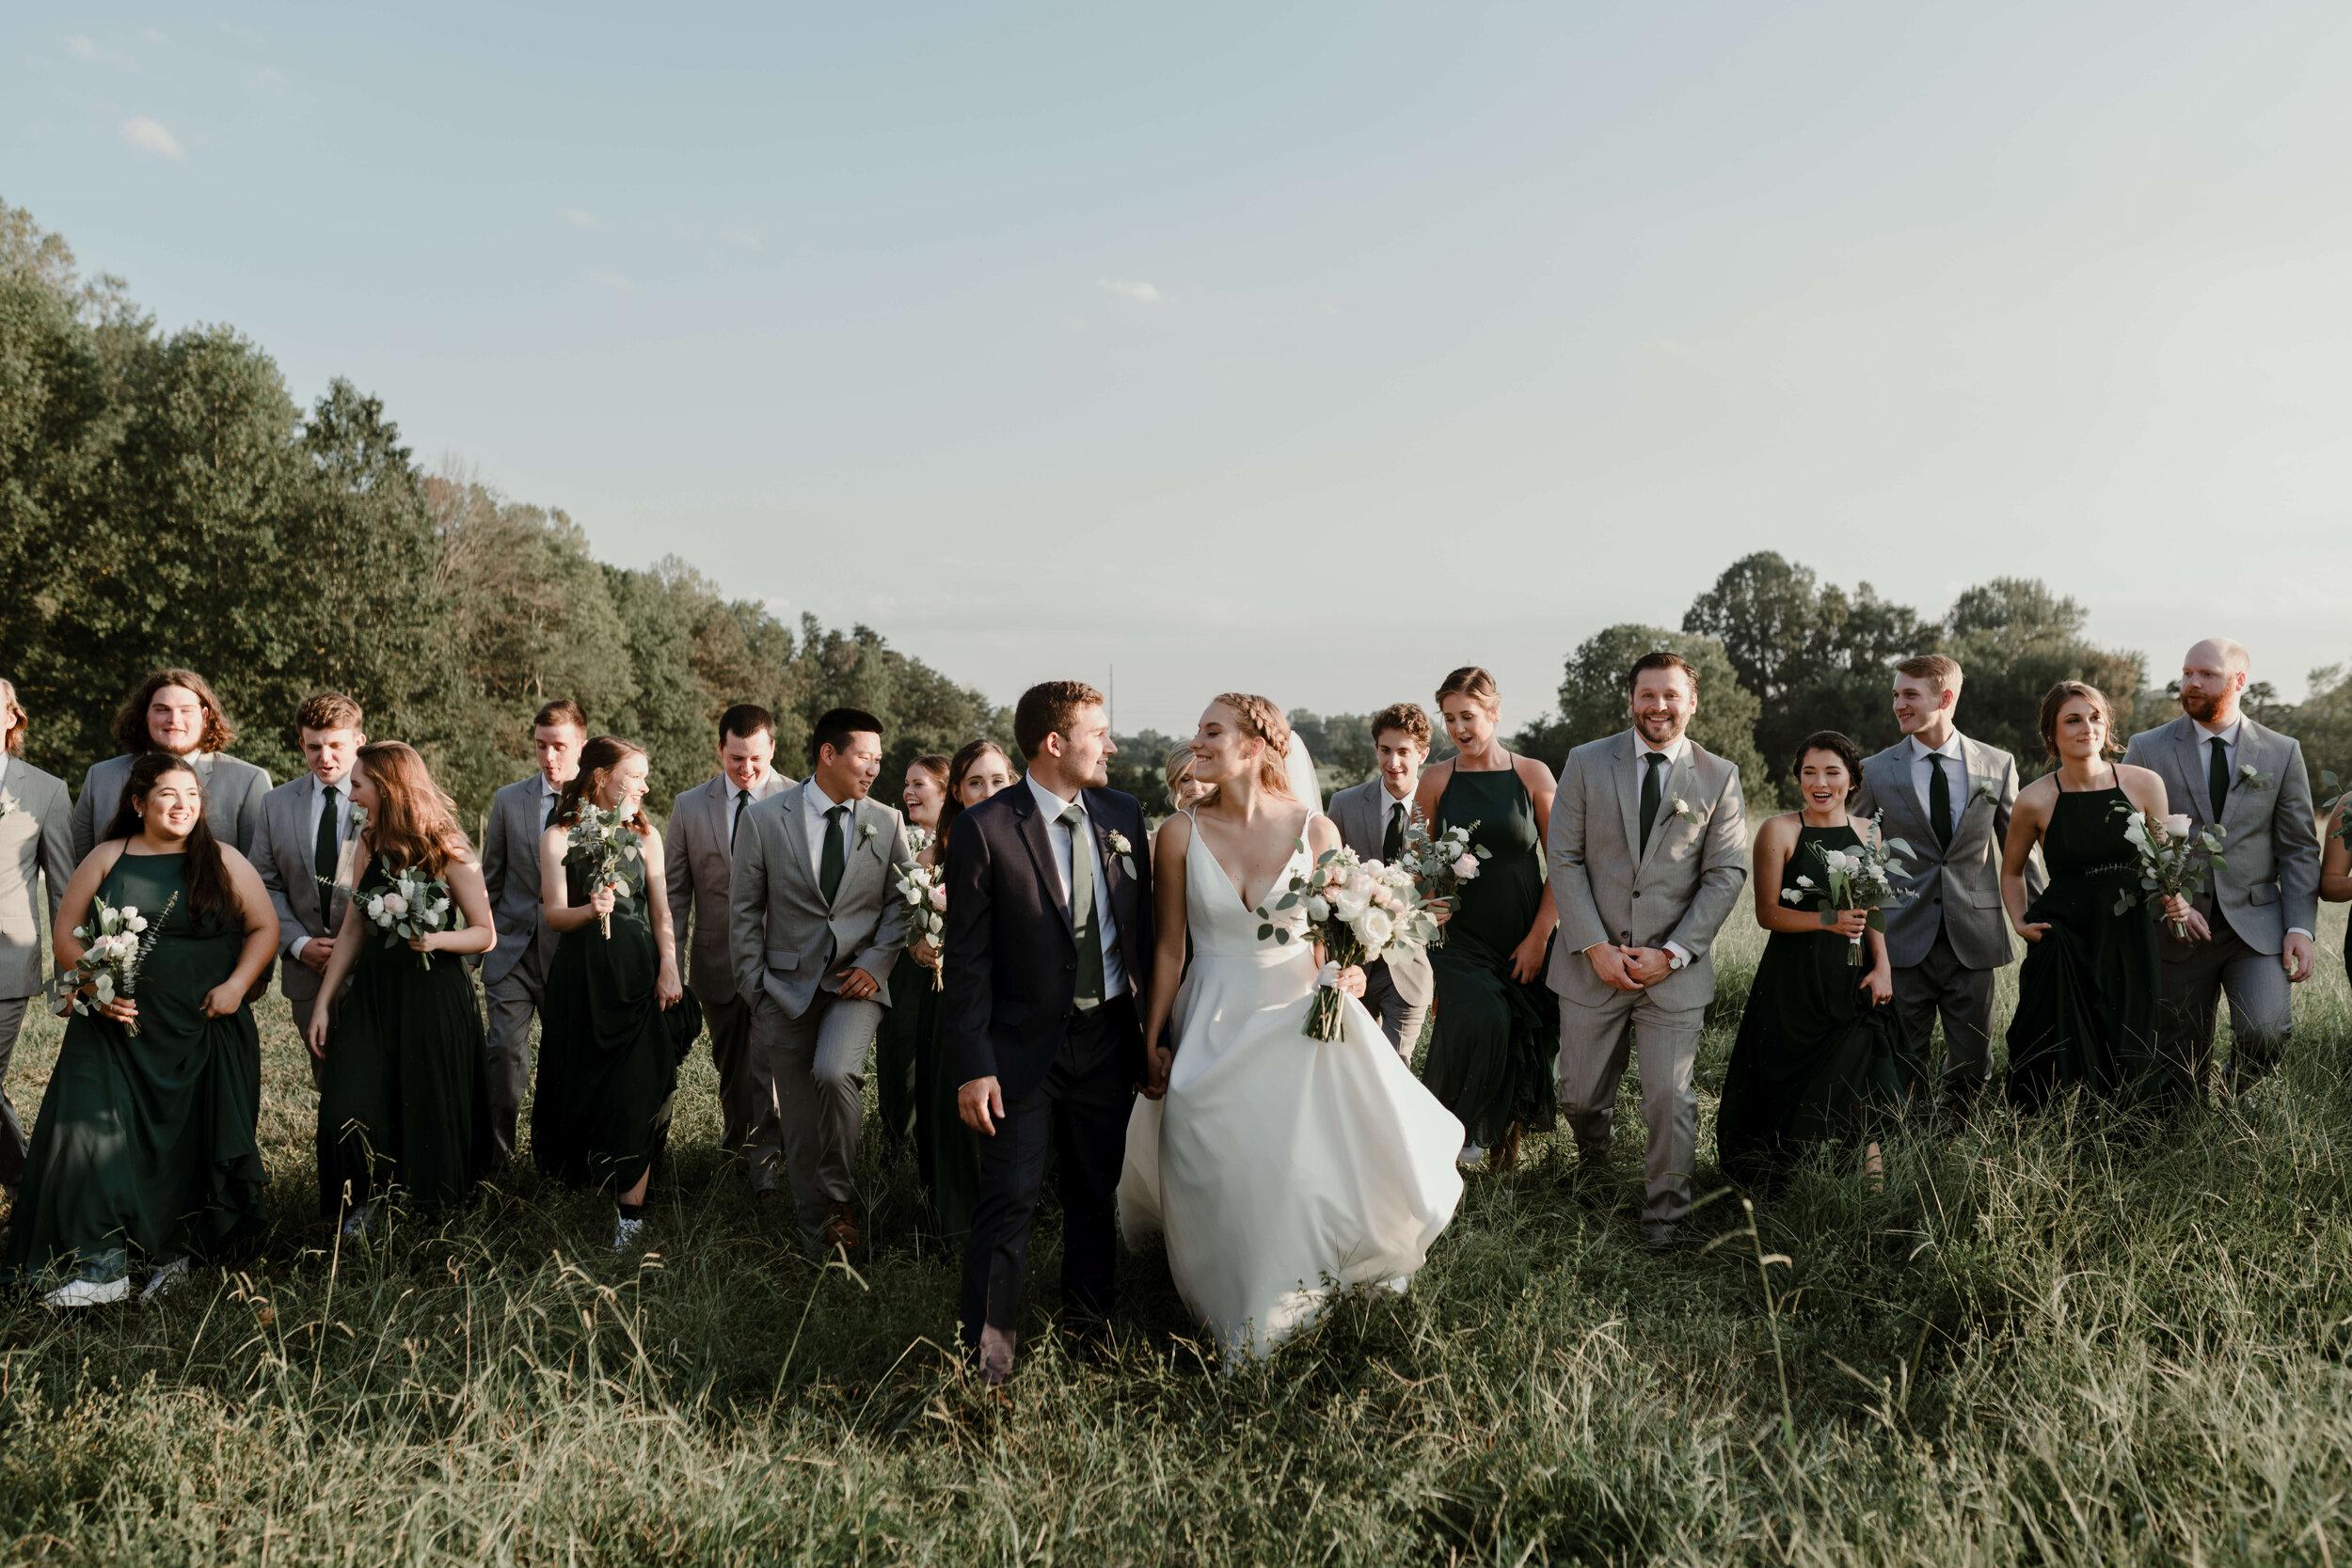 RALEIGH_WEDDING_GABBY_AND_SMITTYDSC_2243.jpg